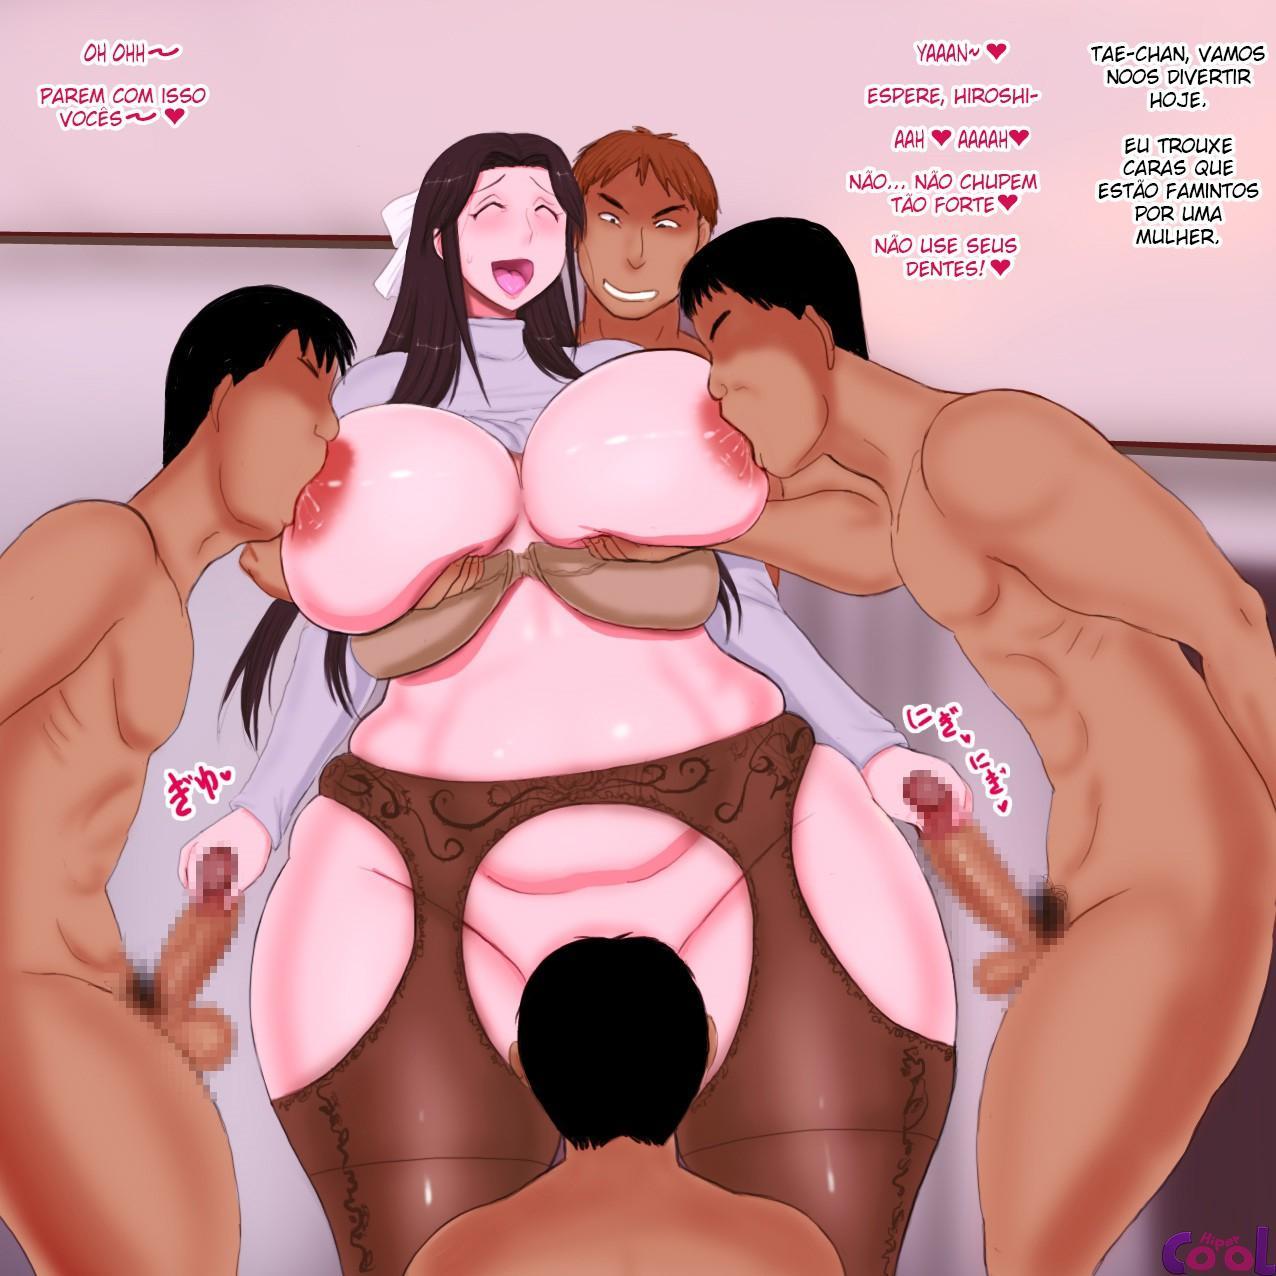 Dona de casa puta hentai